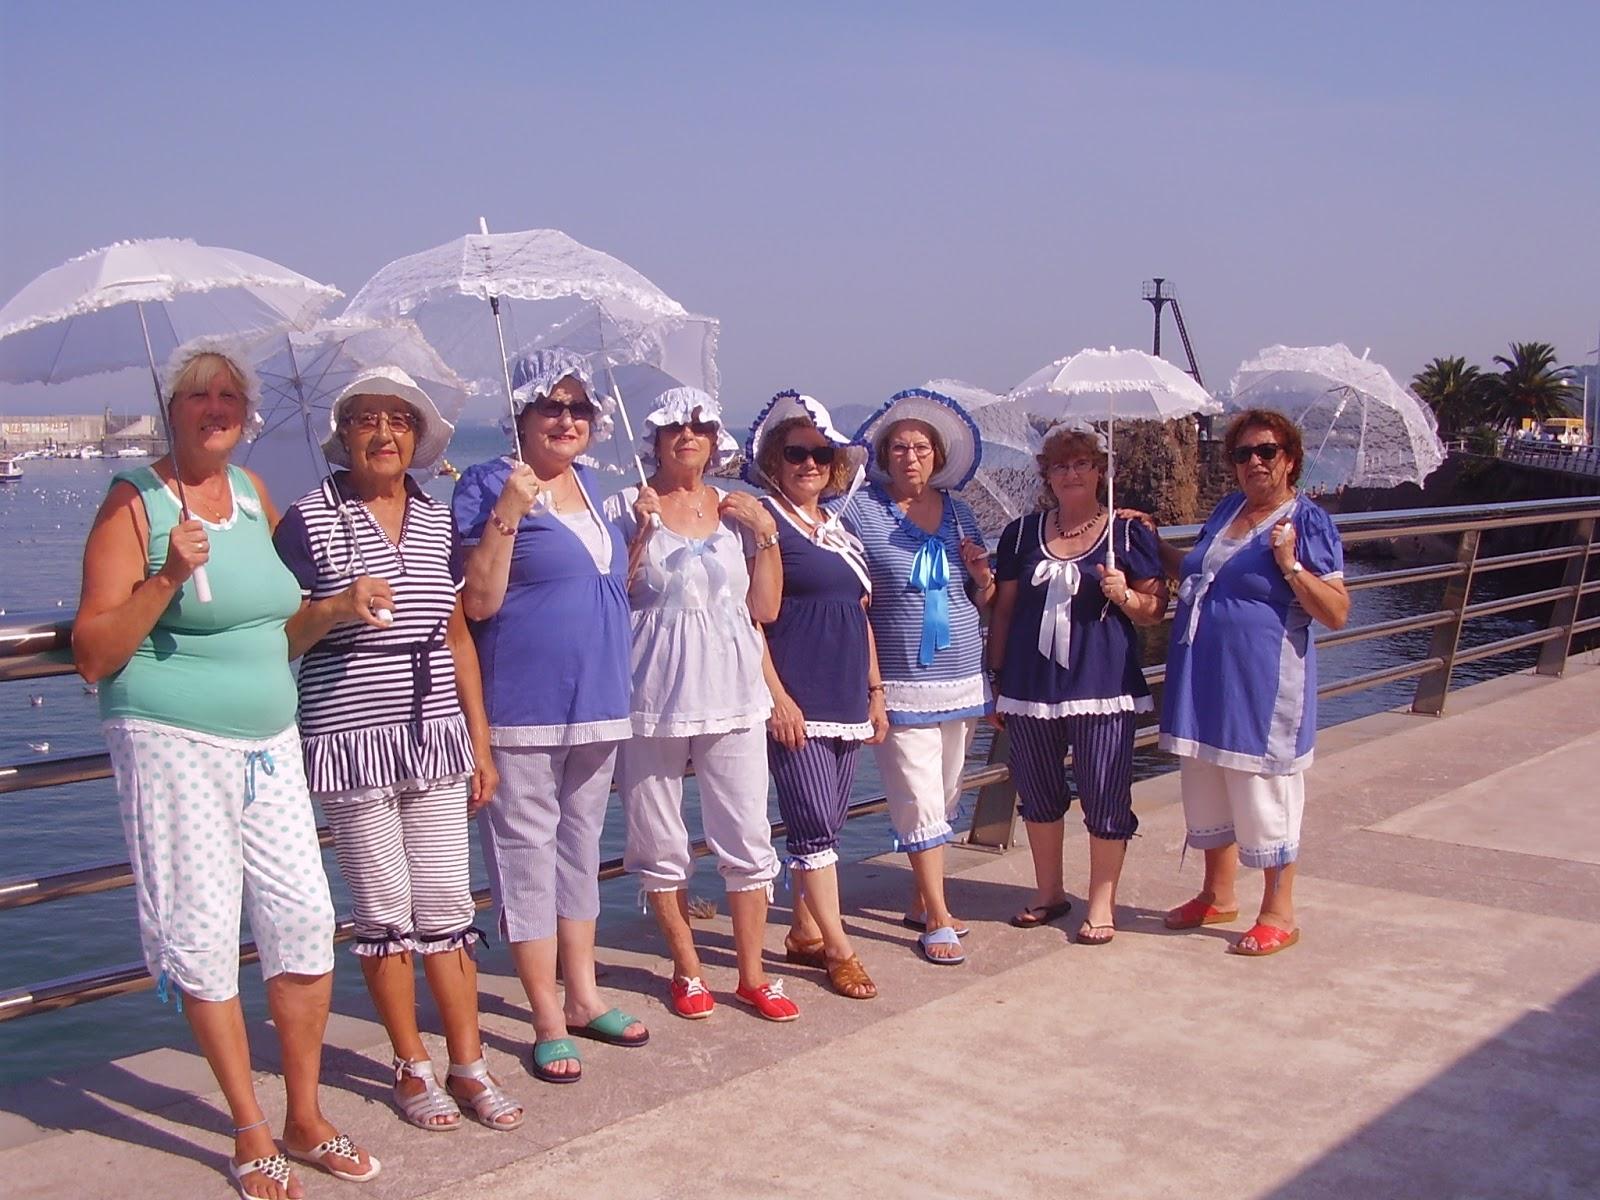 Banos De Epoca.Asociacion Libre De Mujeres De La Corredoria Candas Banos